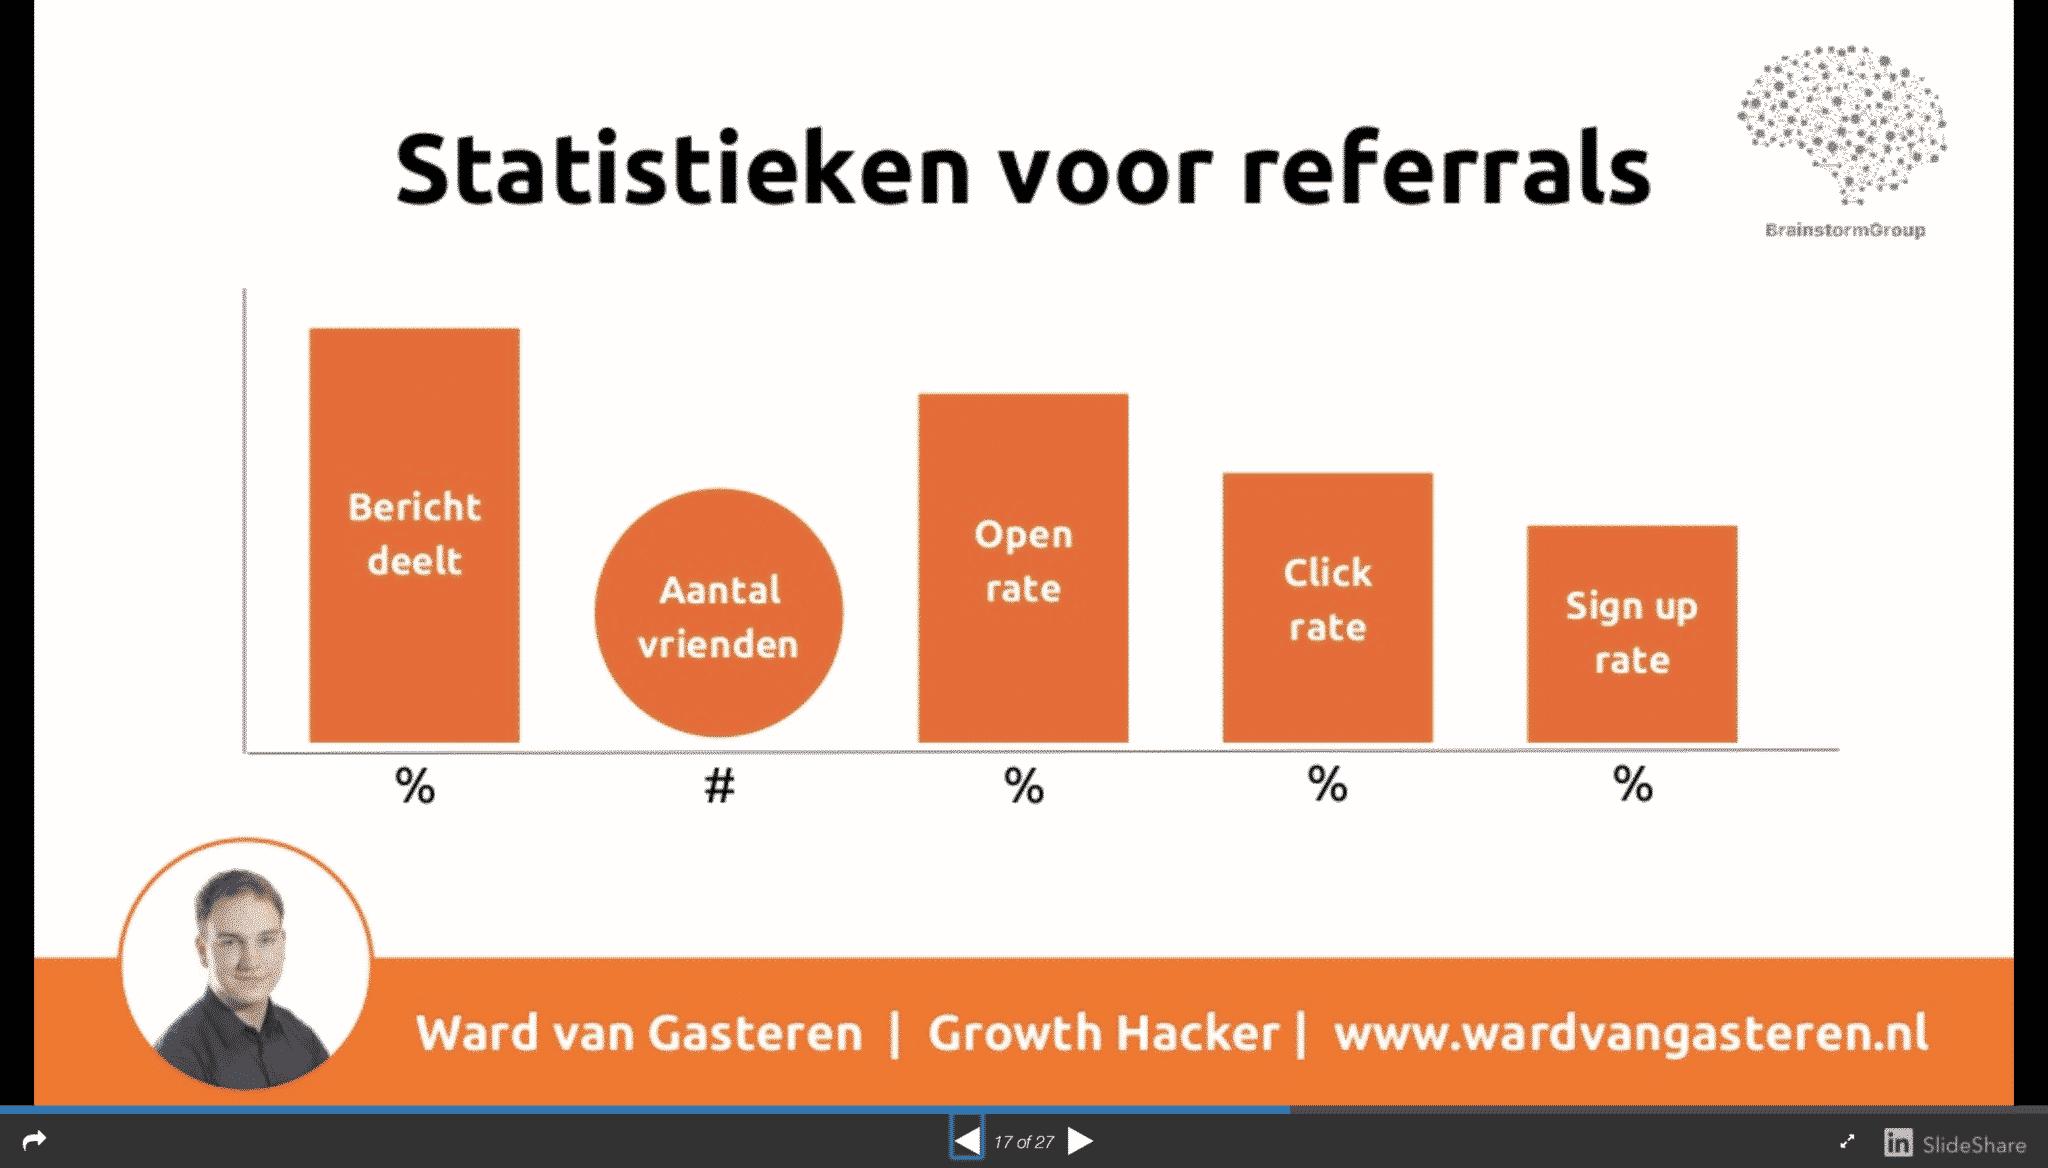 Ward van Gasteren Referral Metrics for Growth Hackers